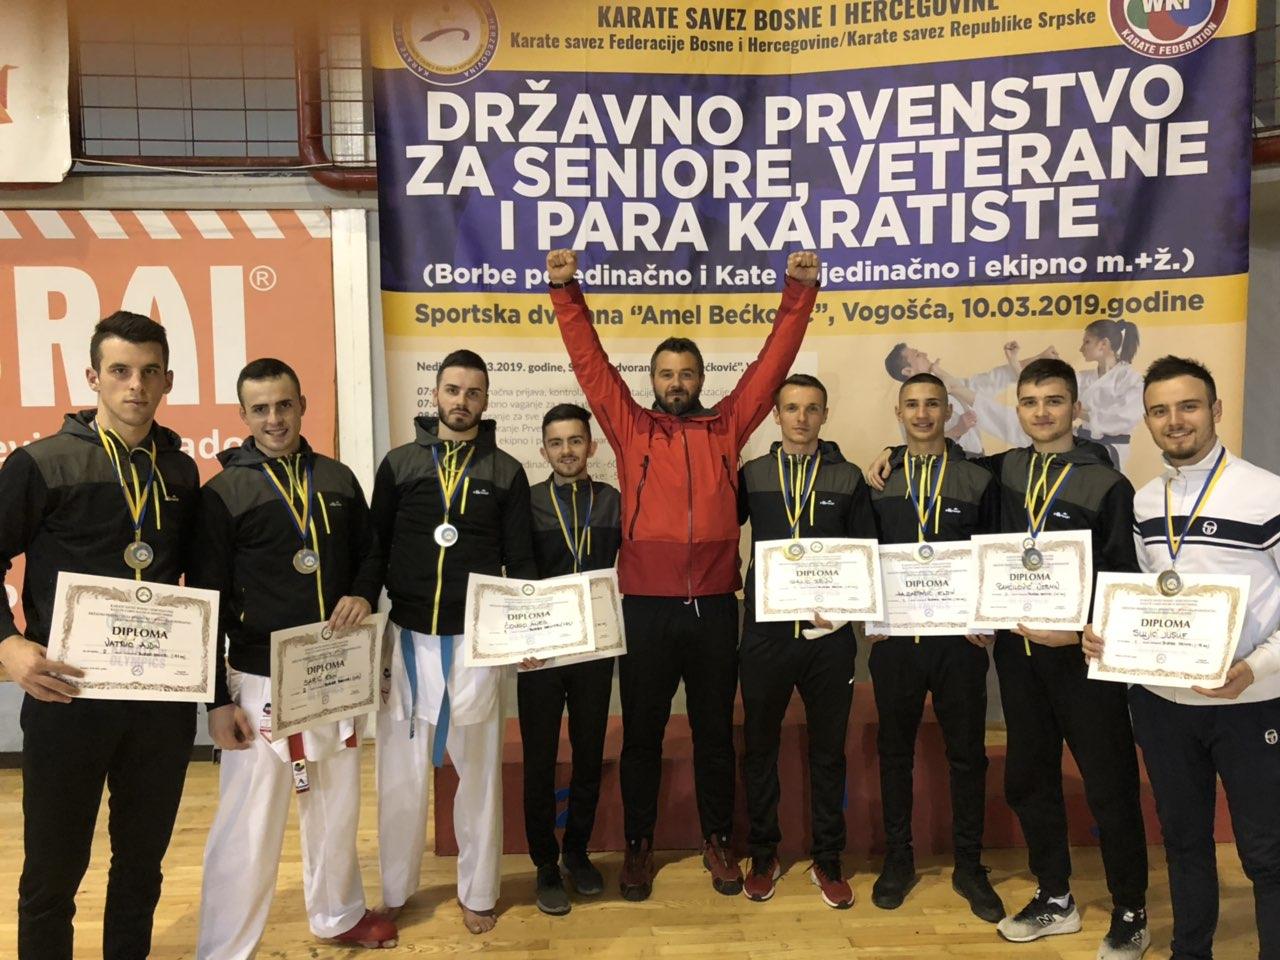 Ervin Galic karate prvak BiH - najbolja ekipa